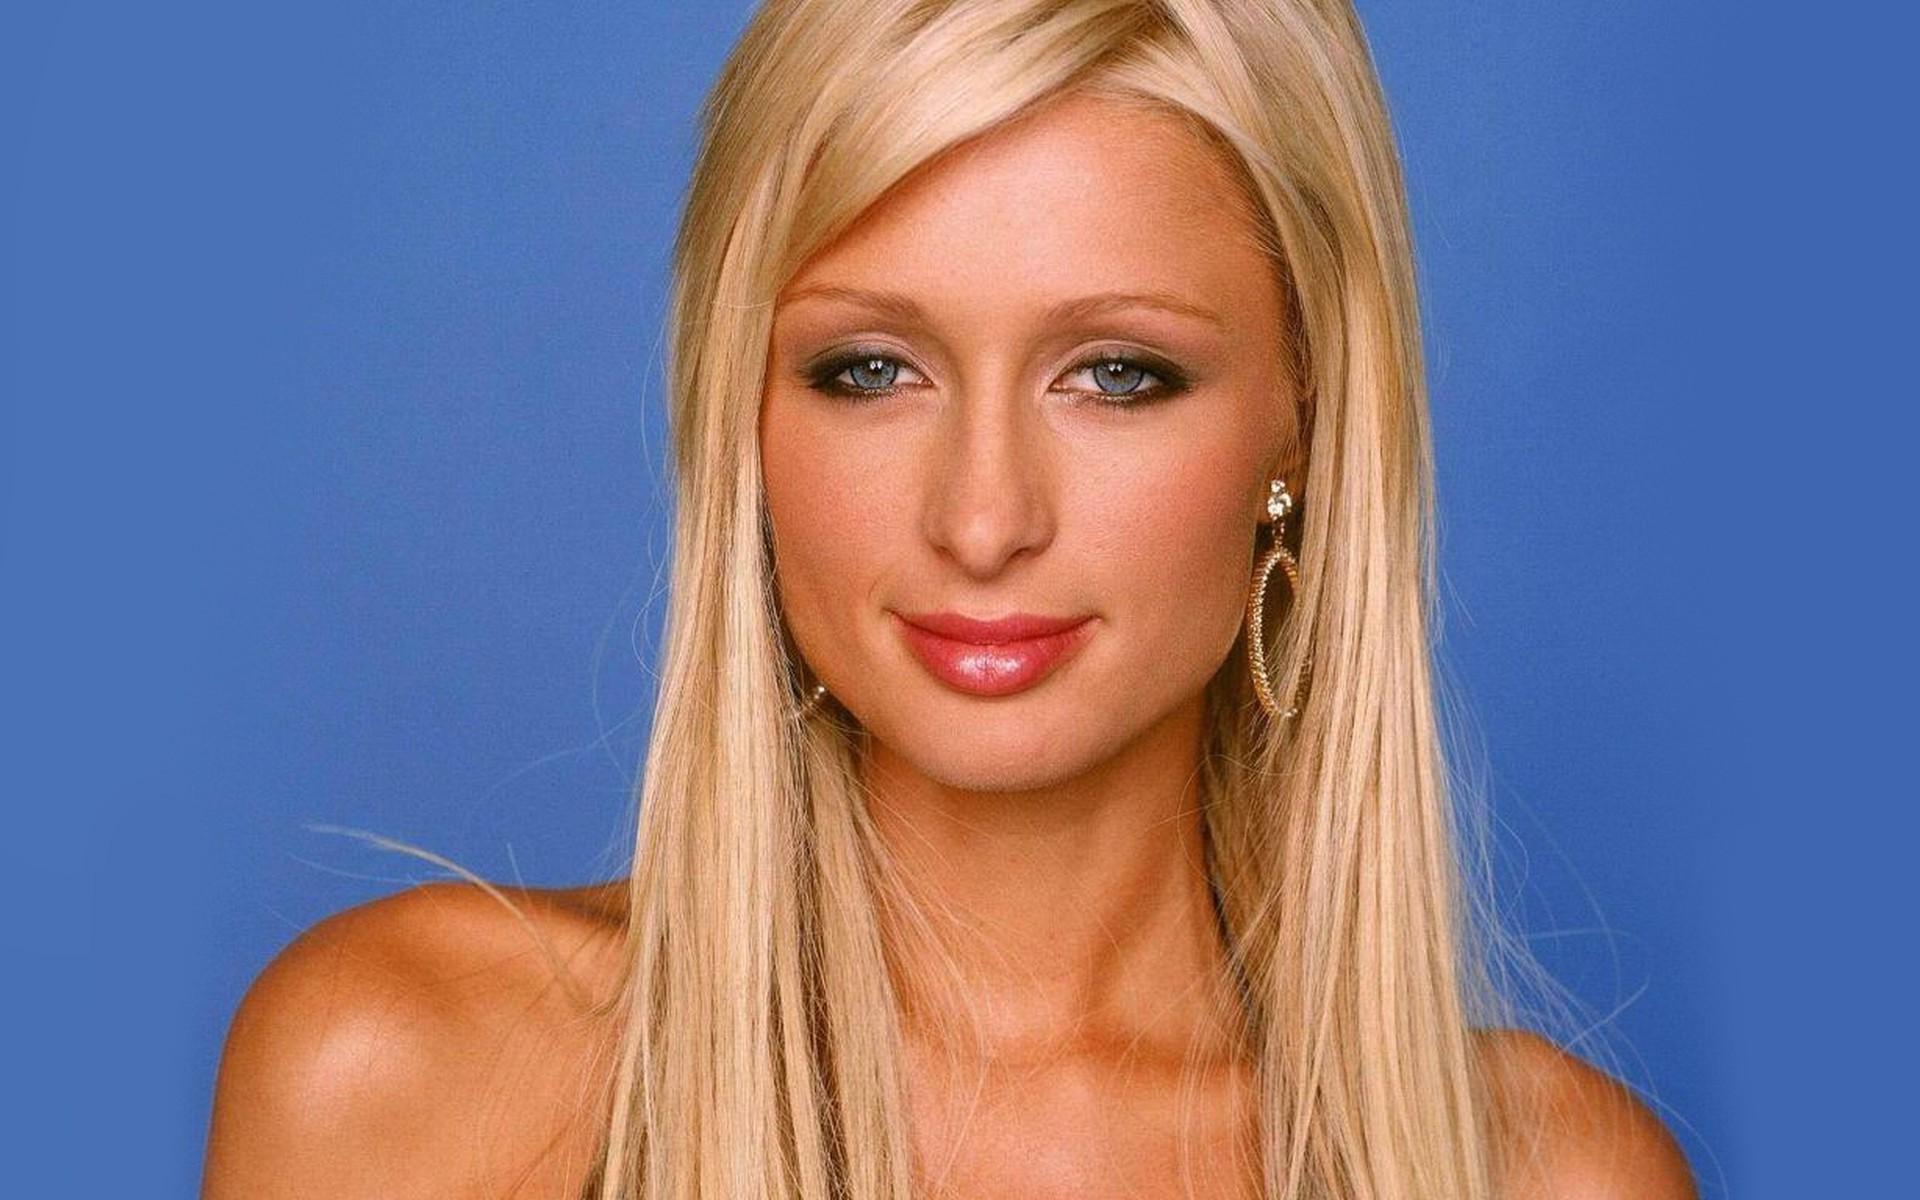 Paris Hilton thinks her zodiac sign makes her similar to Albert Einstein